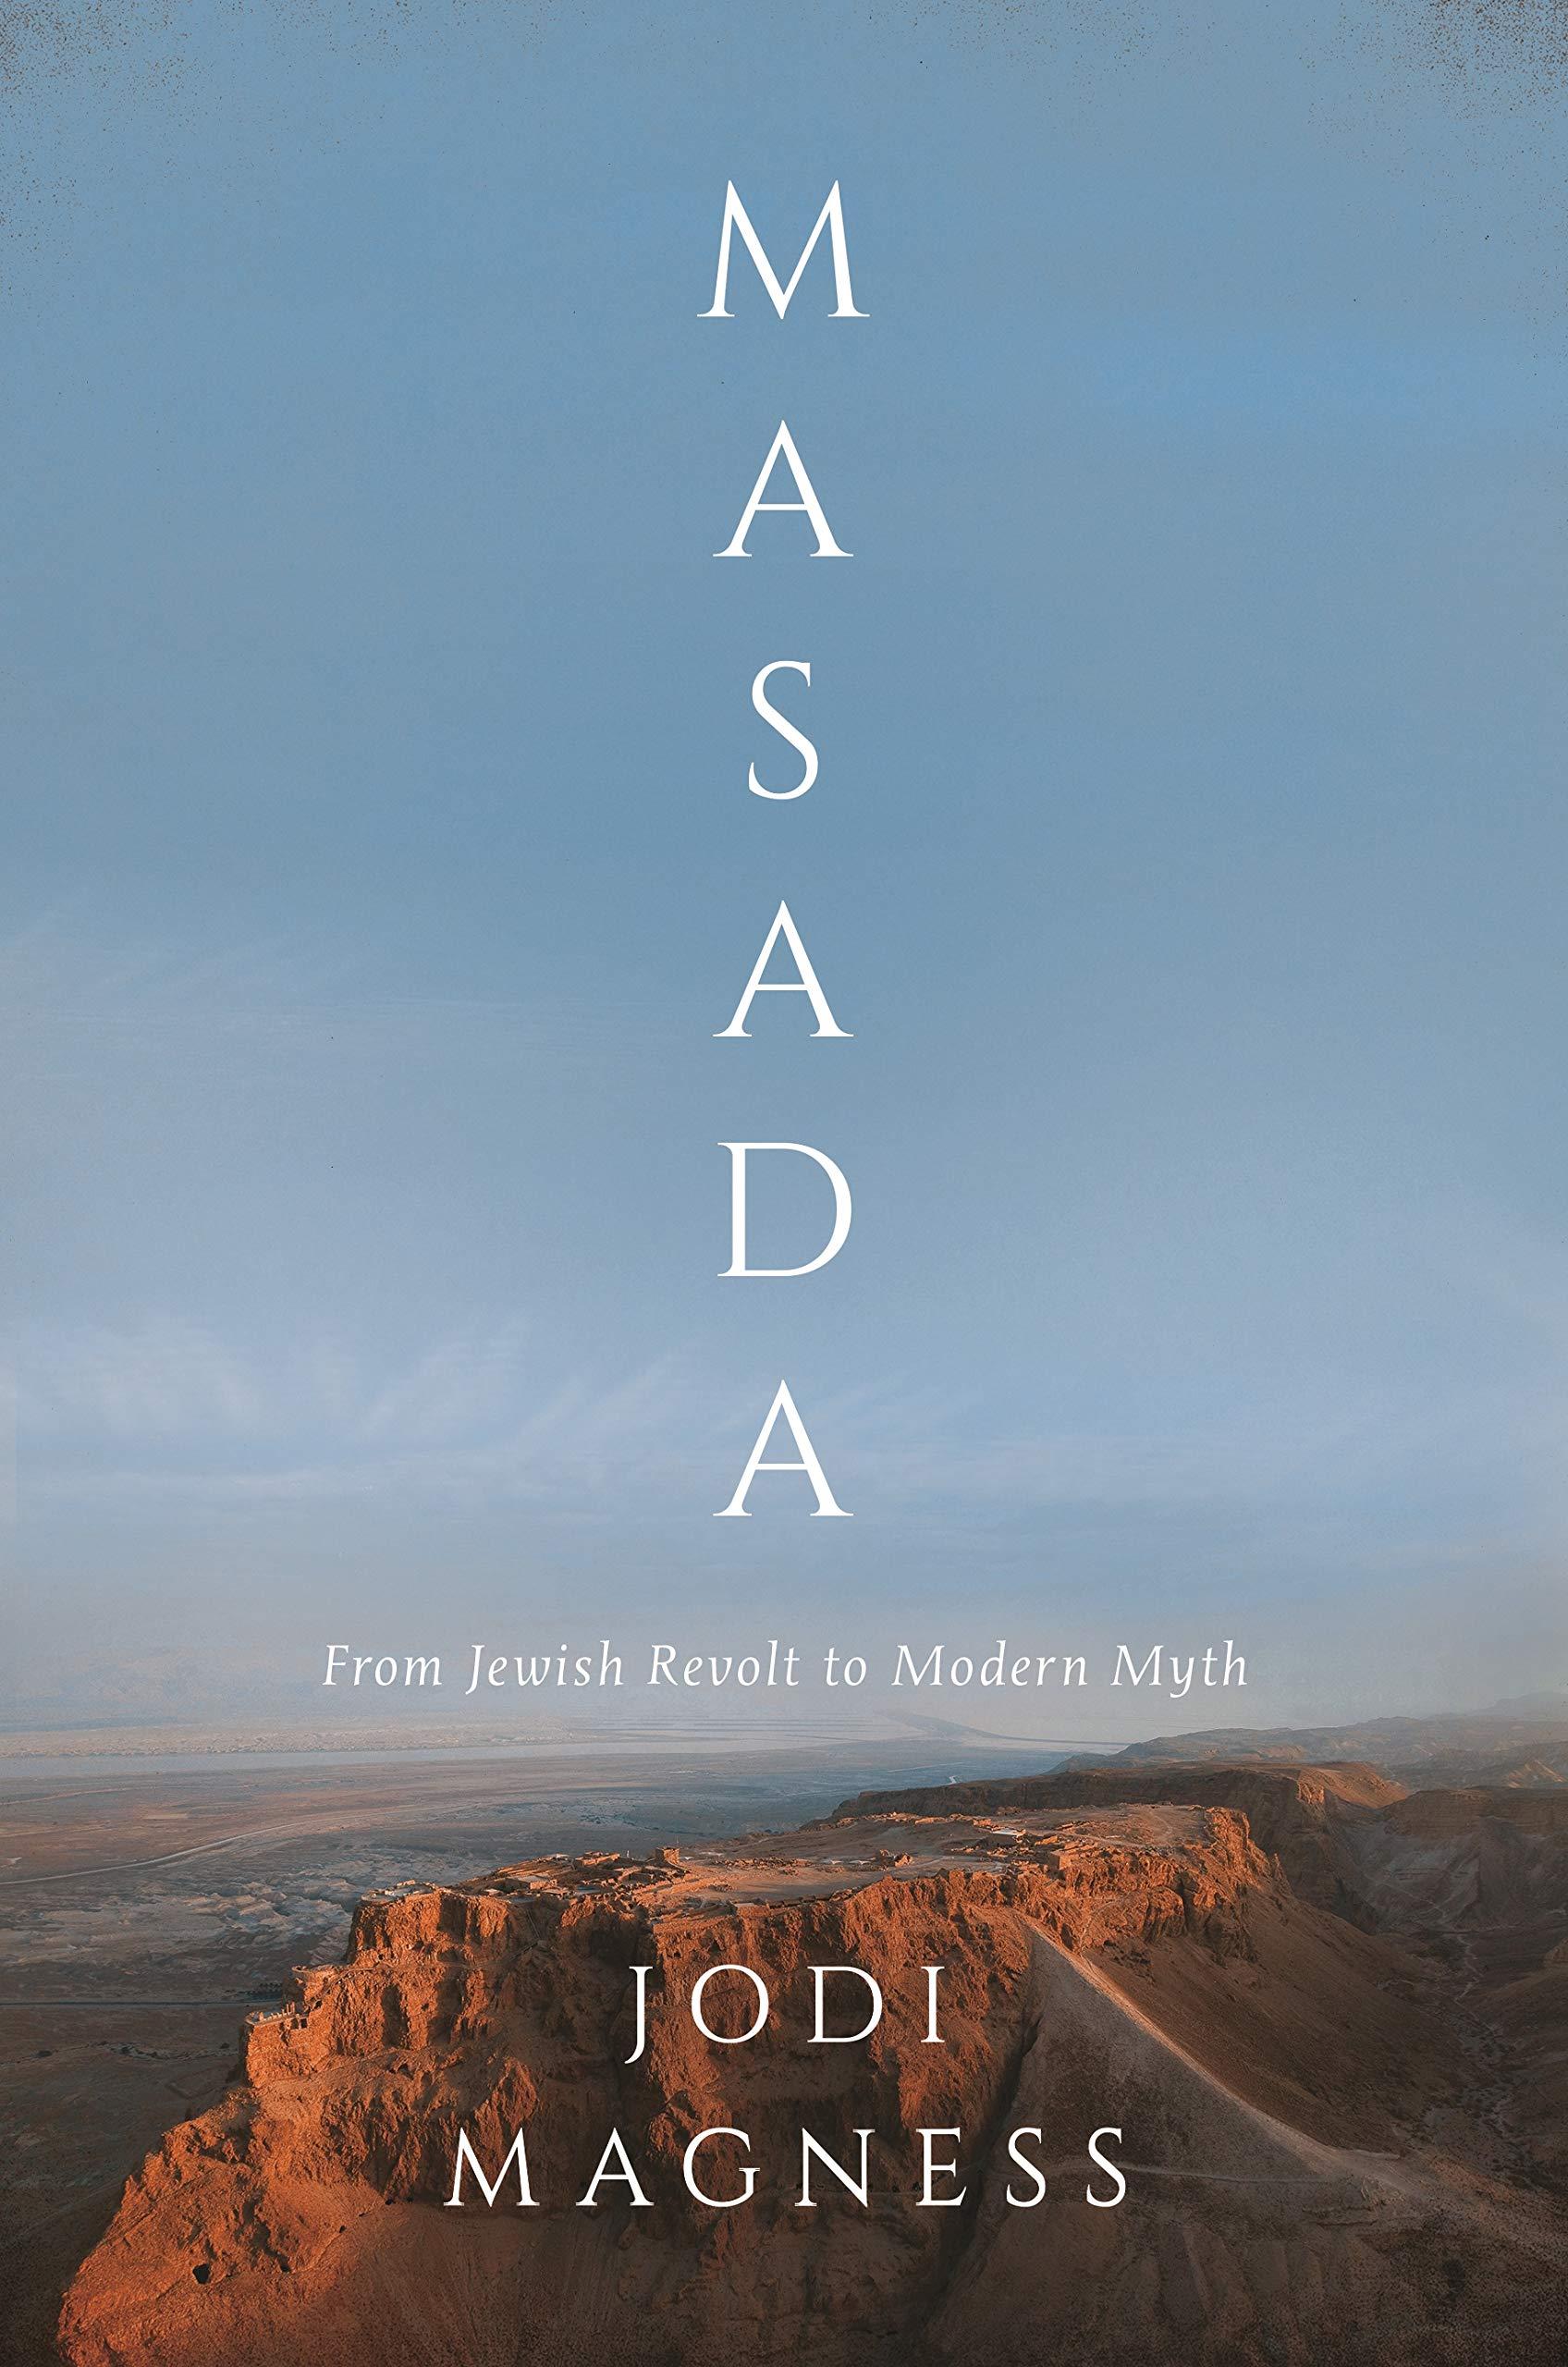 Masada: From Jewish Revolt to Modern Myth: Magness, Jodi: 9780691167107: Amazon.com: Books